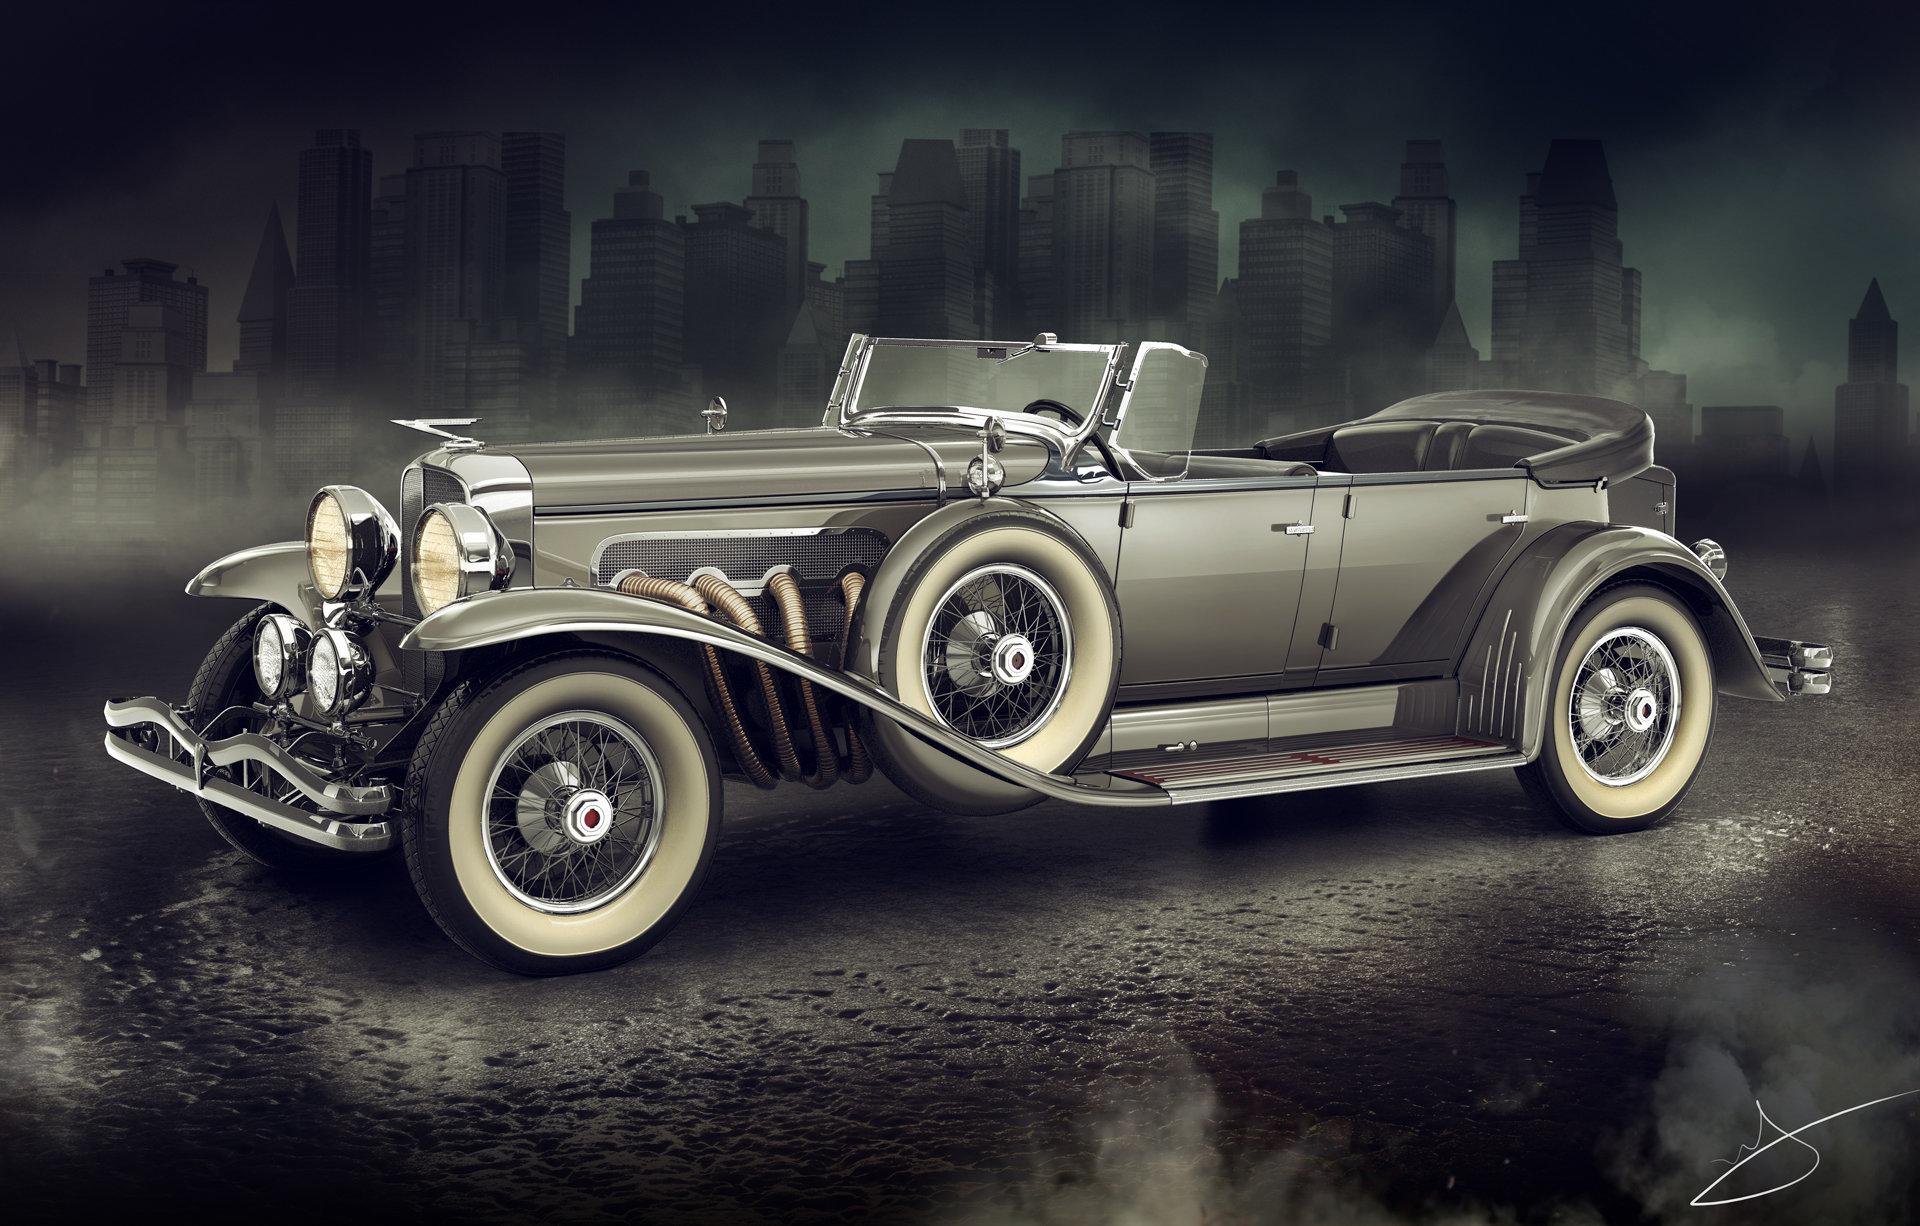 Alexandr novitskiy 1929 duesenberg model j dual cowl phaeton city 03